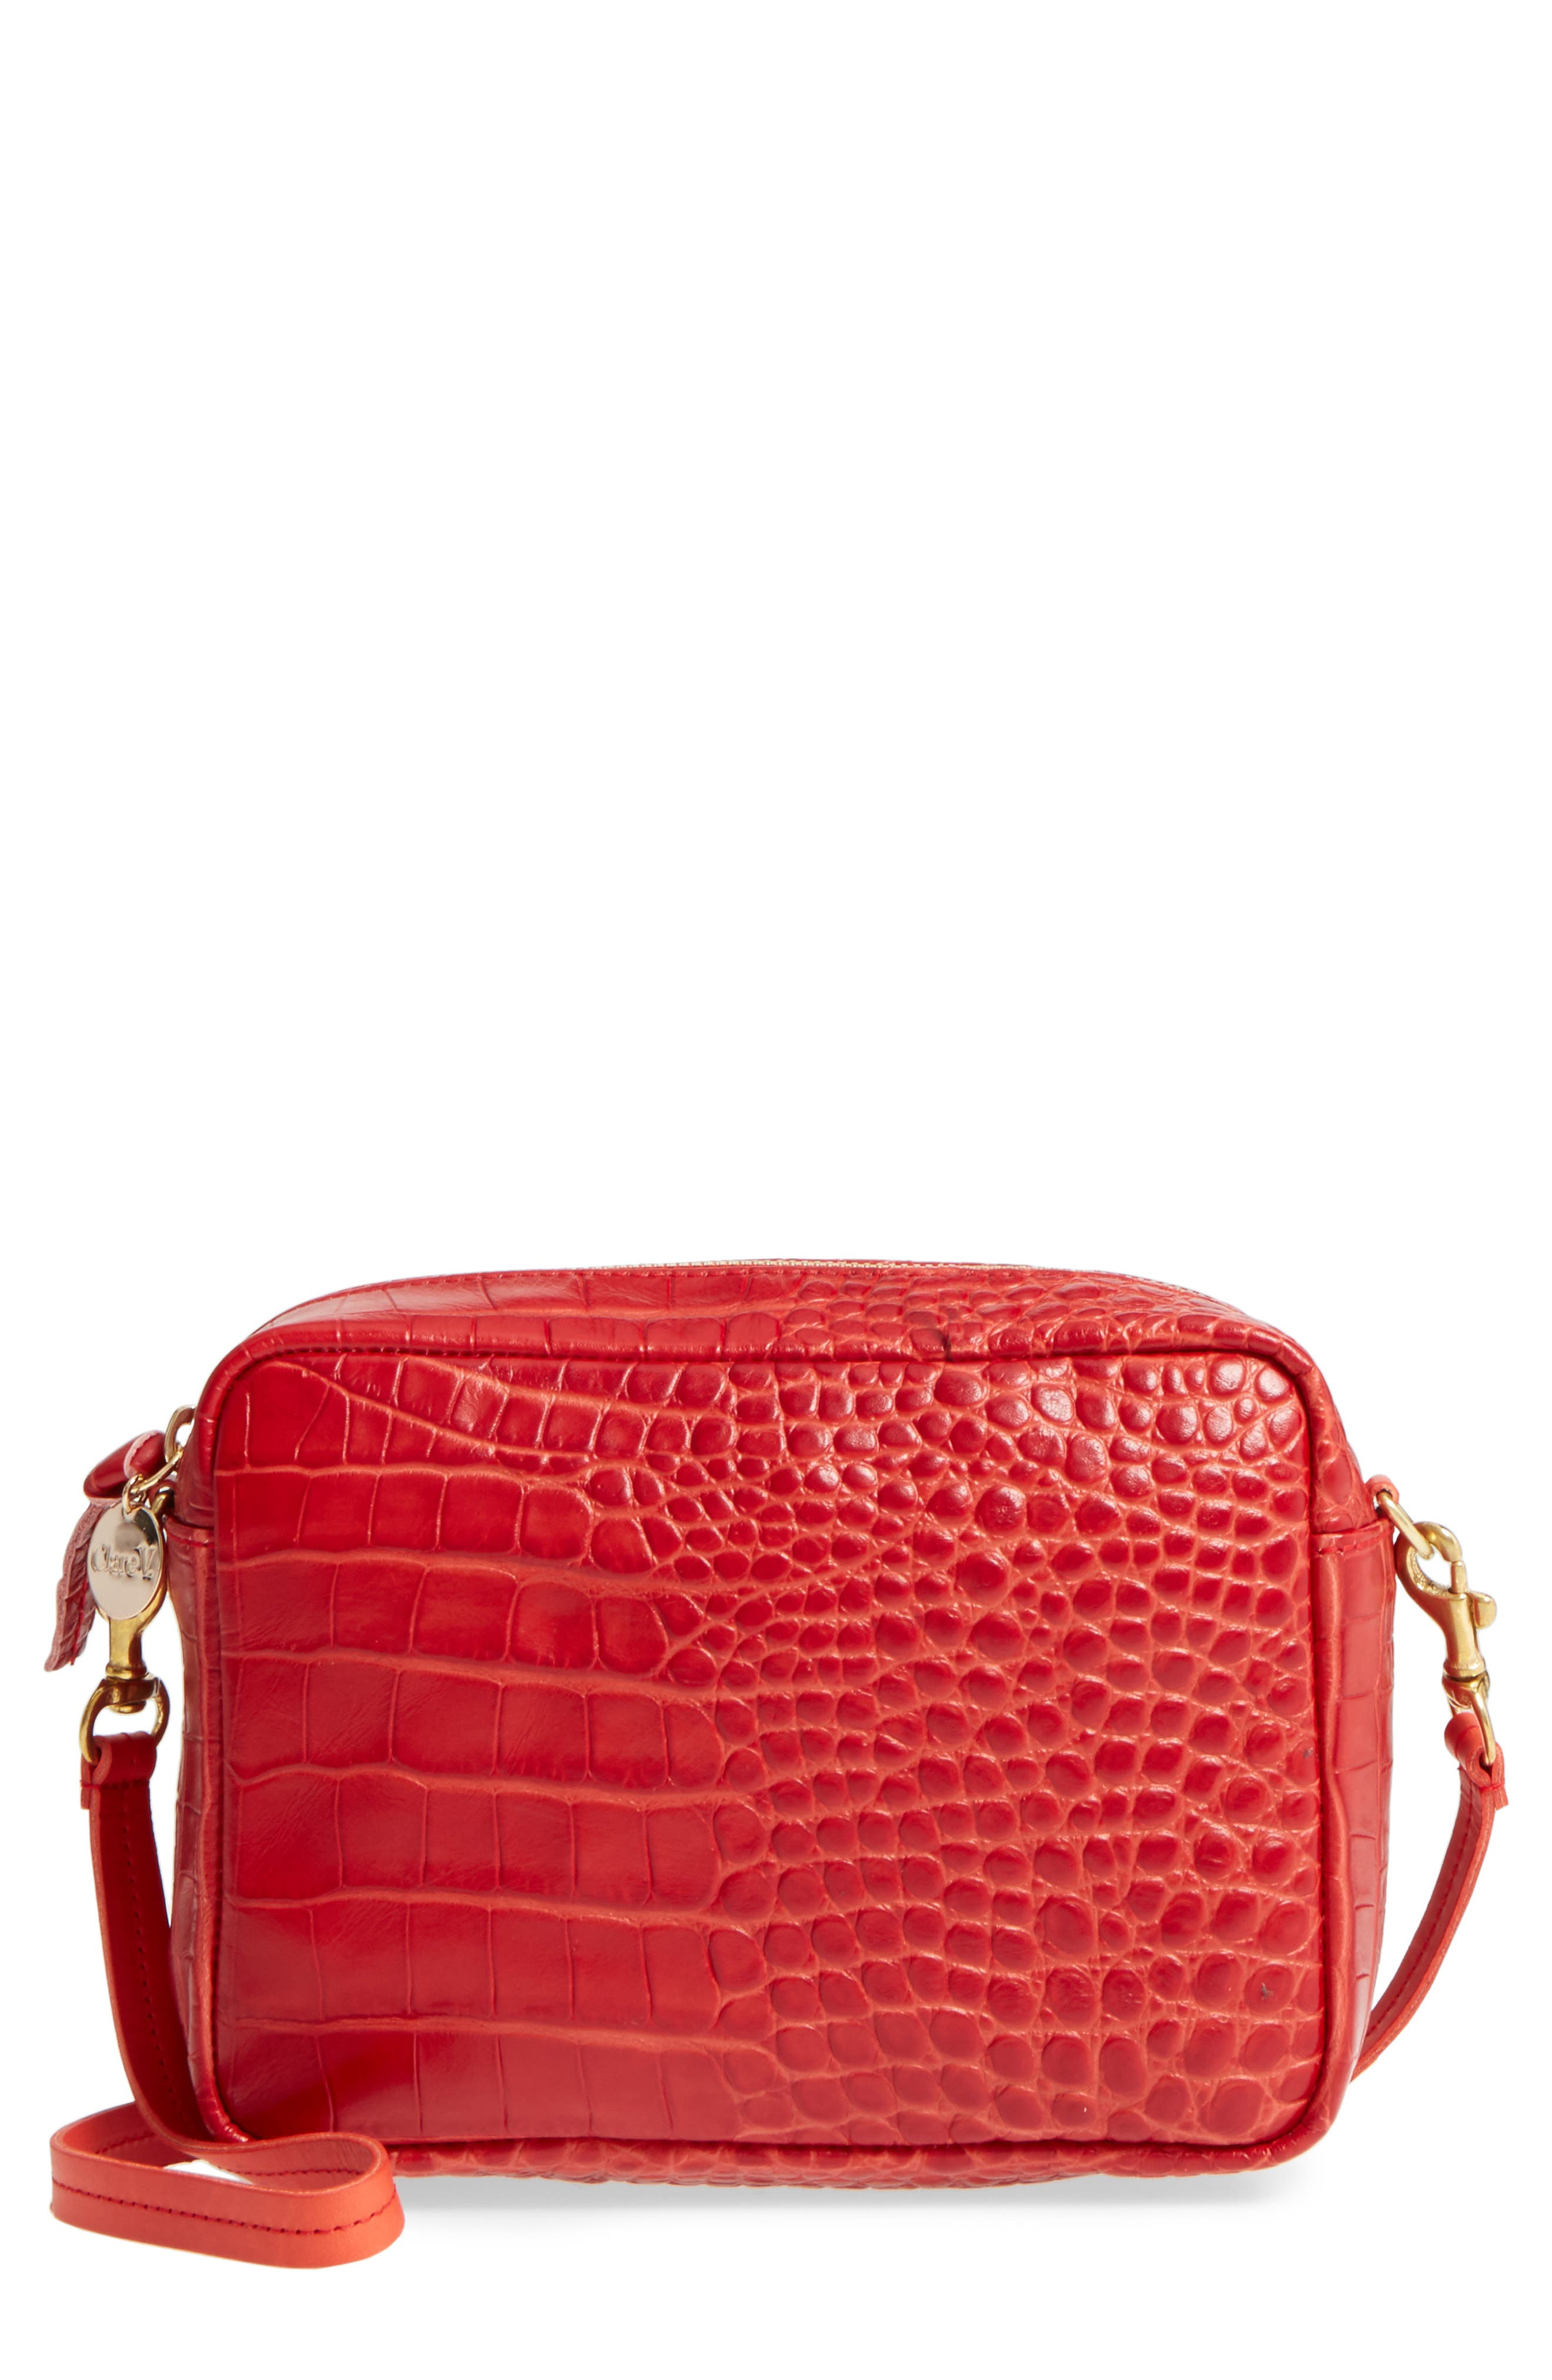 Clare V. Midi Sac Supreme Croc Embossed Leather Crossbody Bag